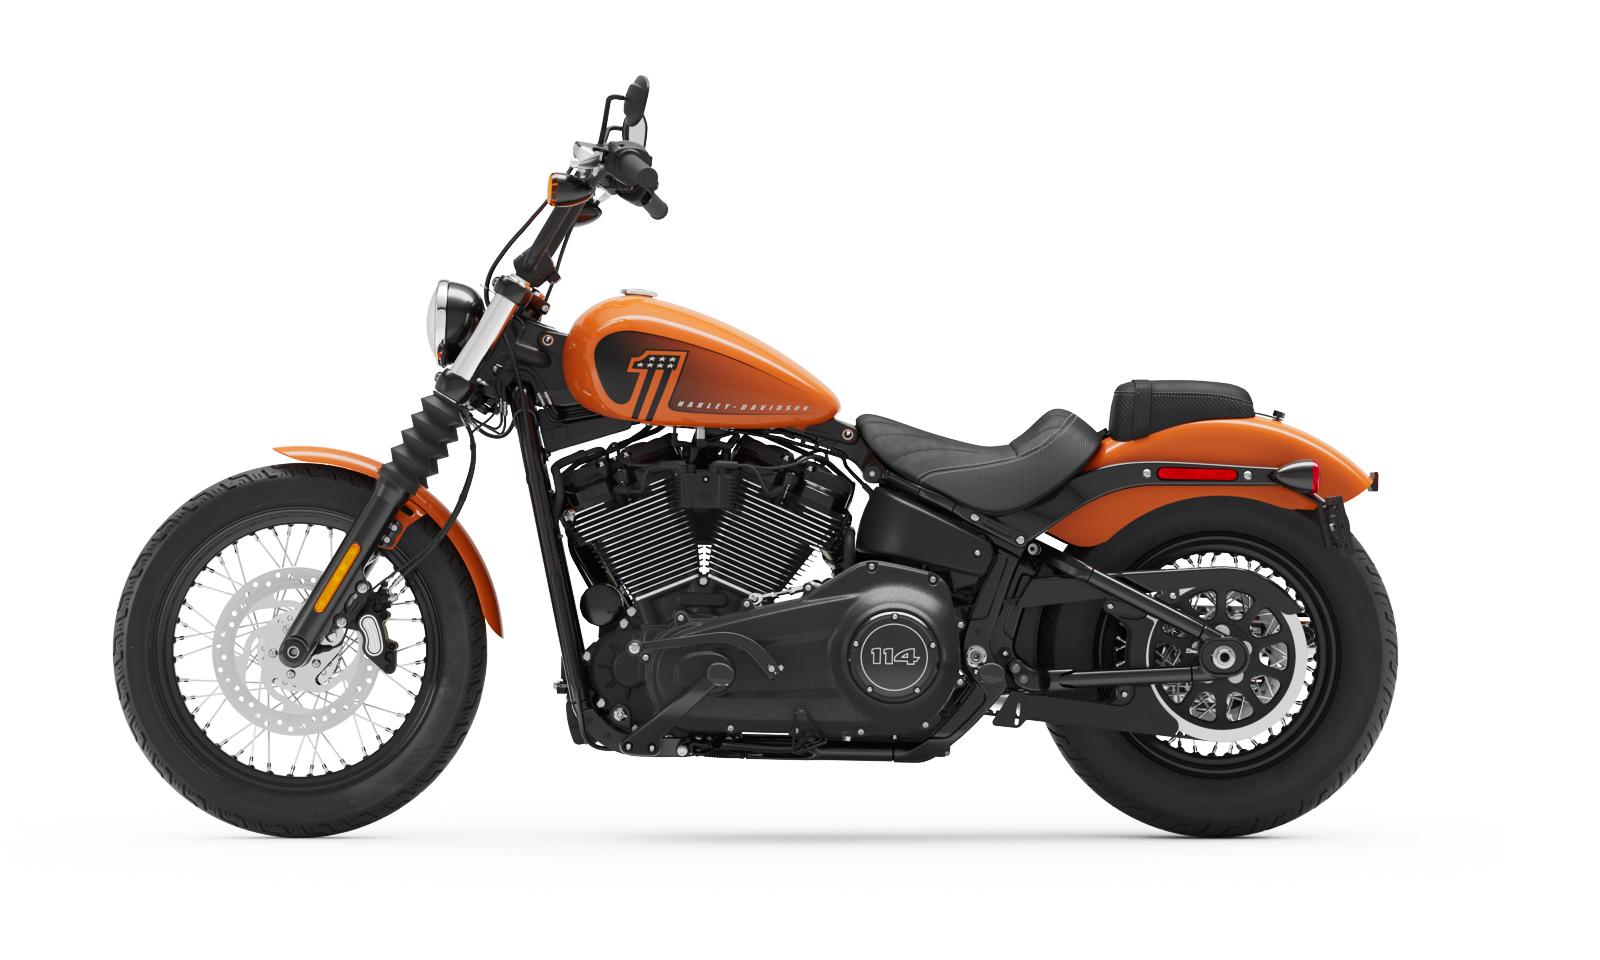 2021 street bob motorcycle harley